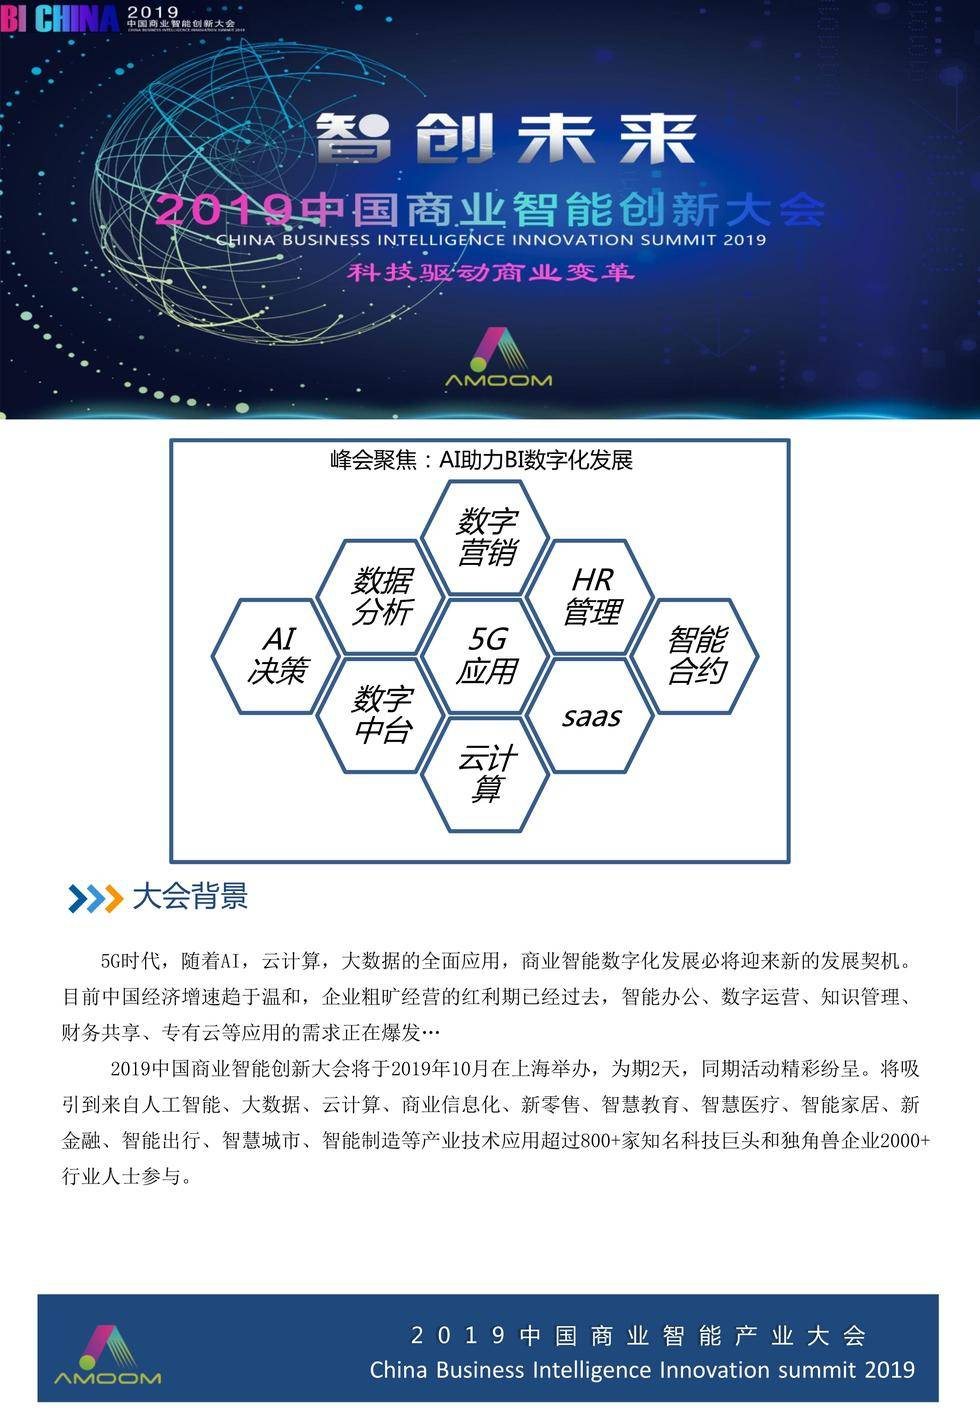 BIChina2019中国商业智能创新大会_1.jpg